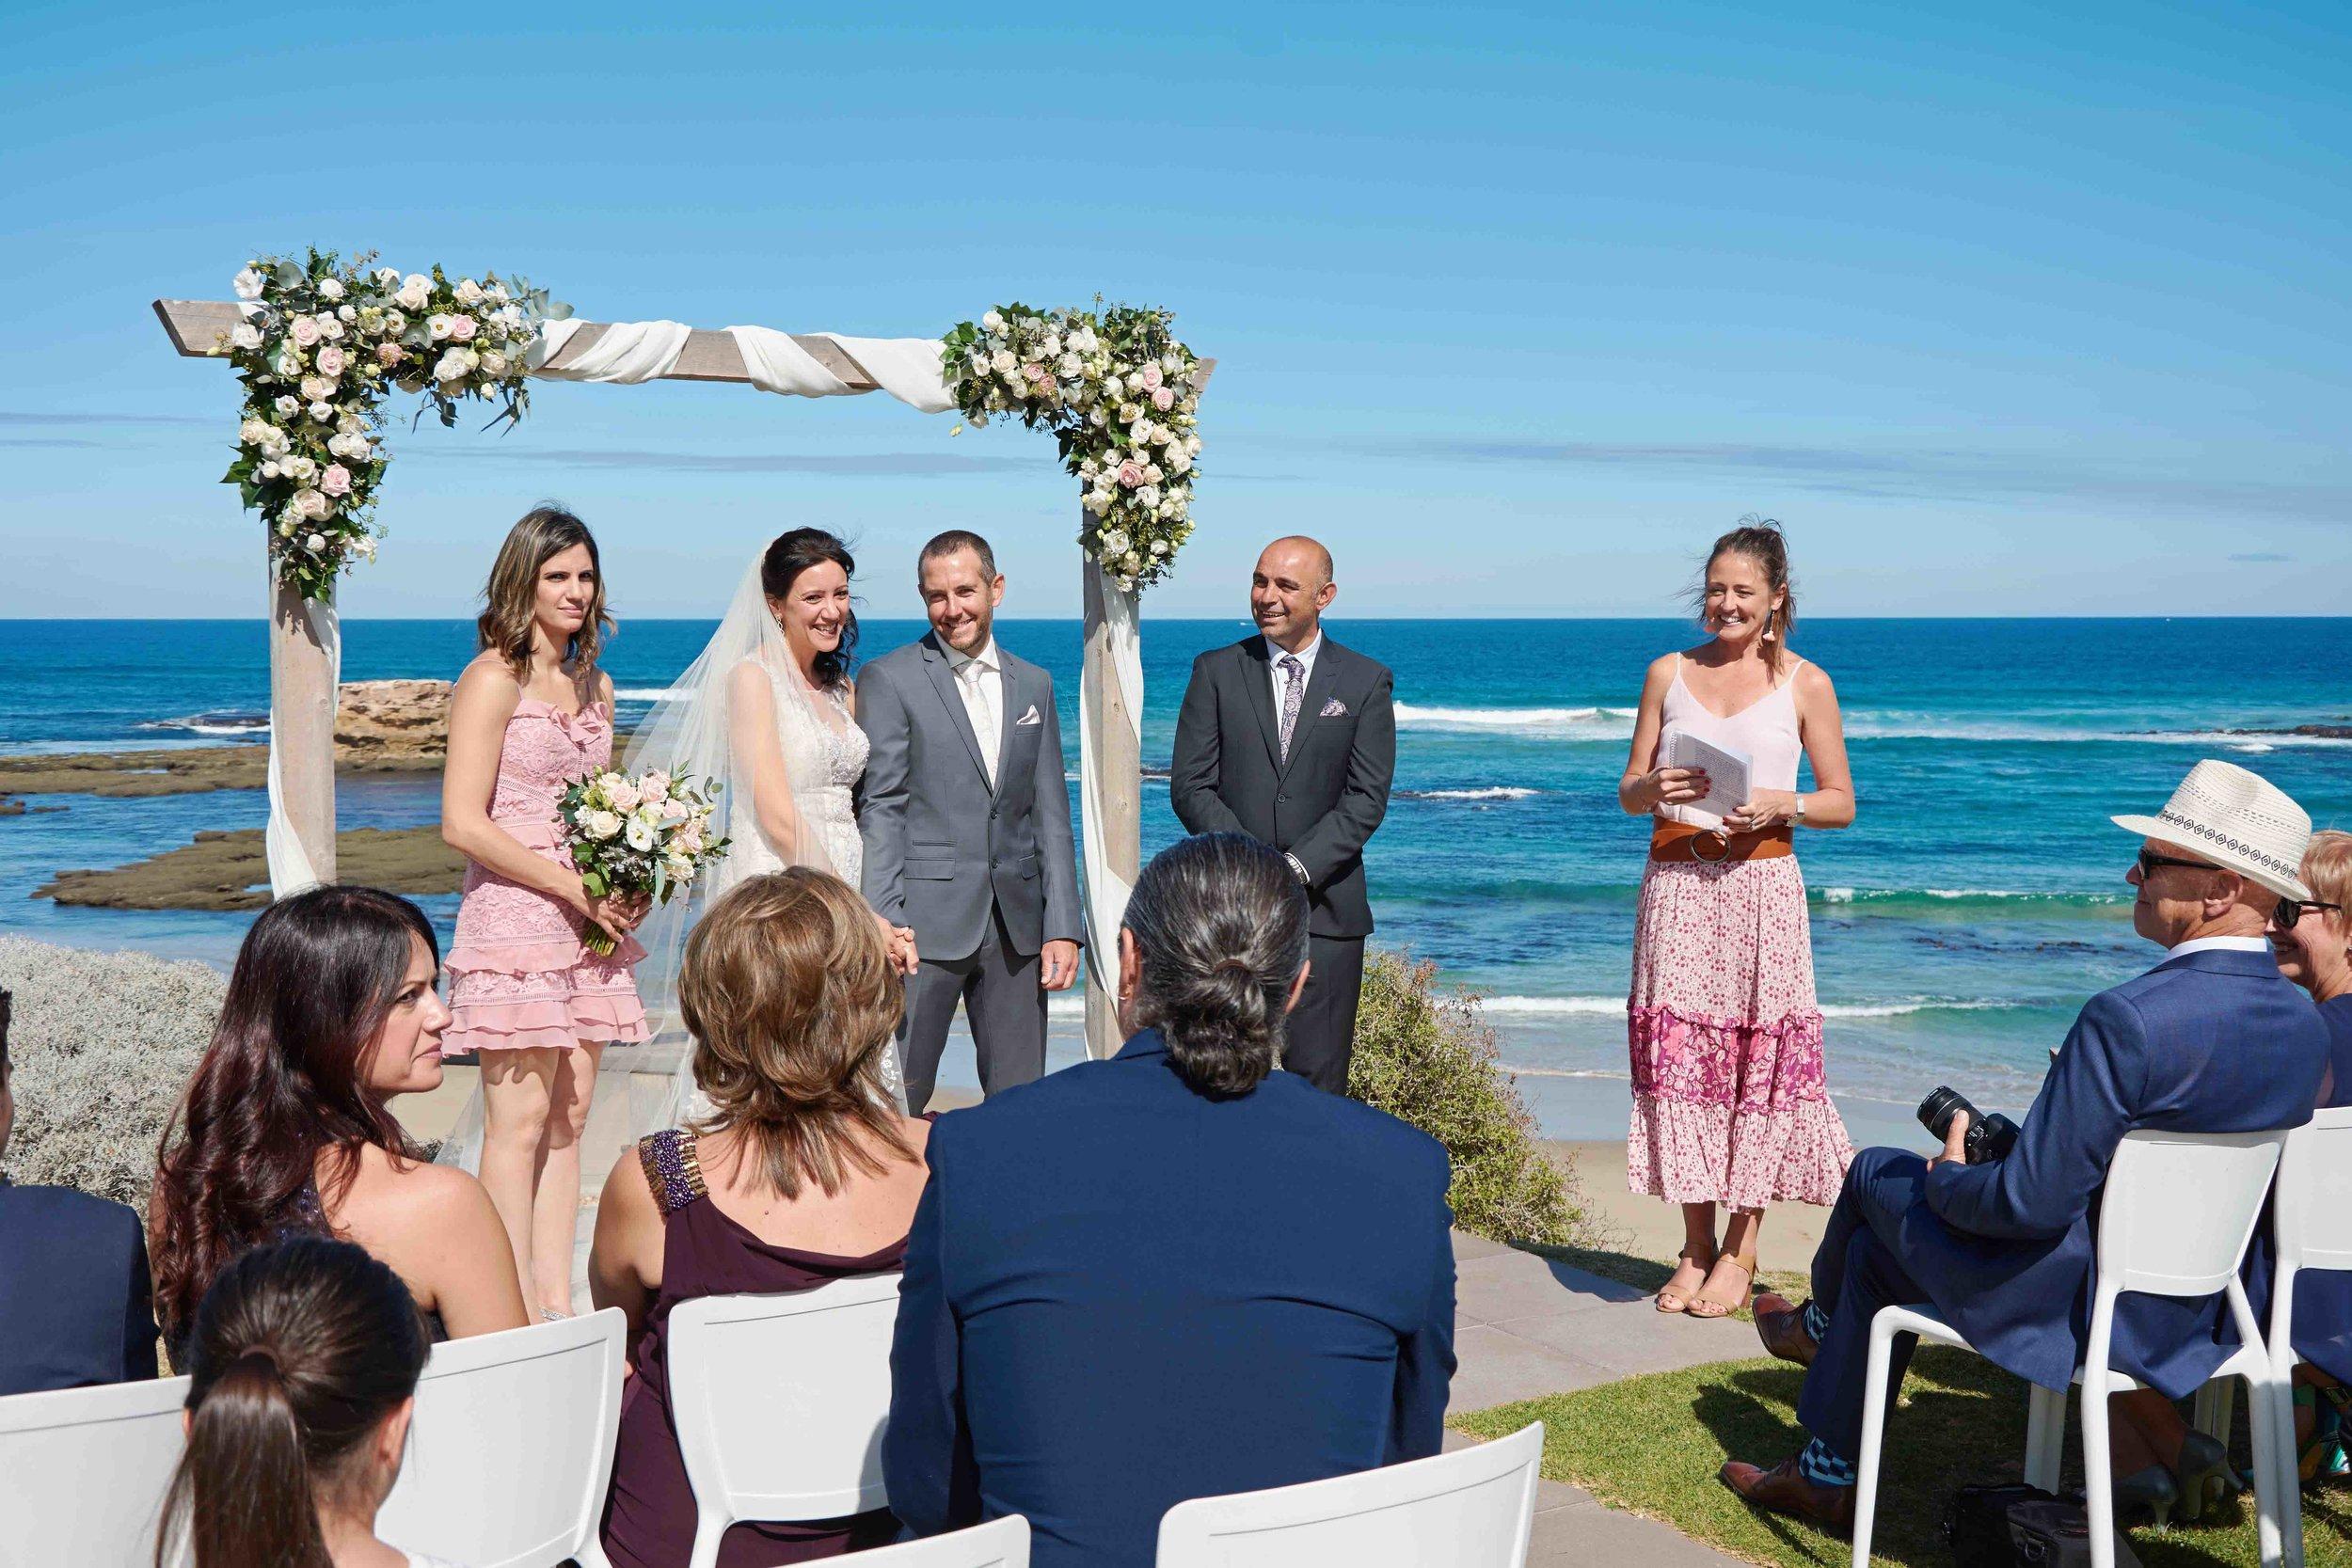 sorrento-wedding-photography-all-smiles-marissa-jade-photography-44.jpg